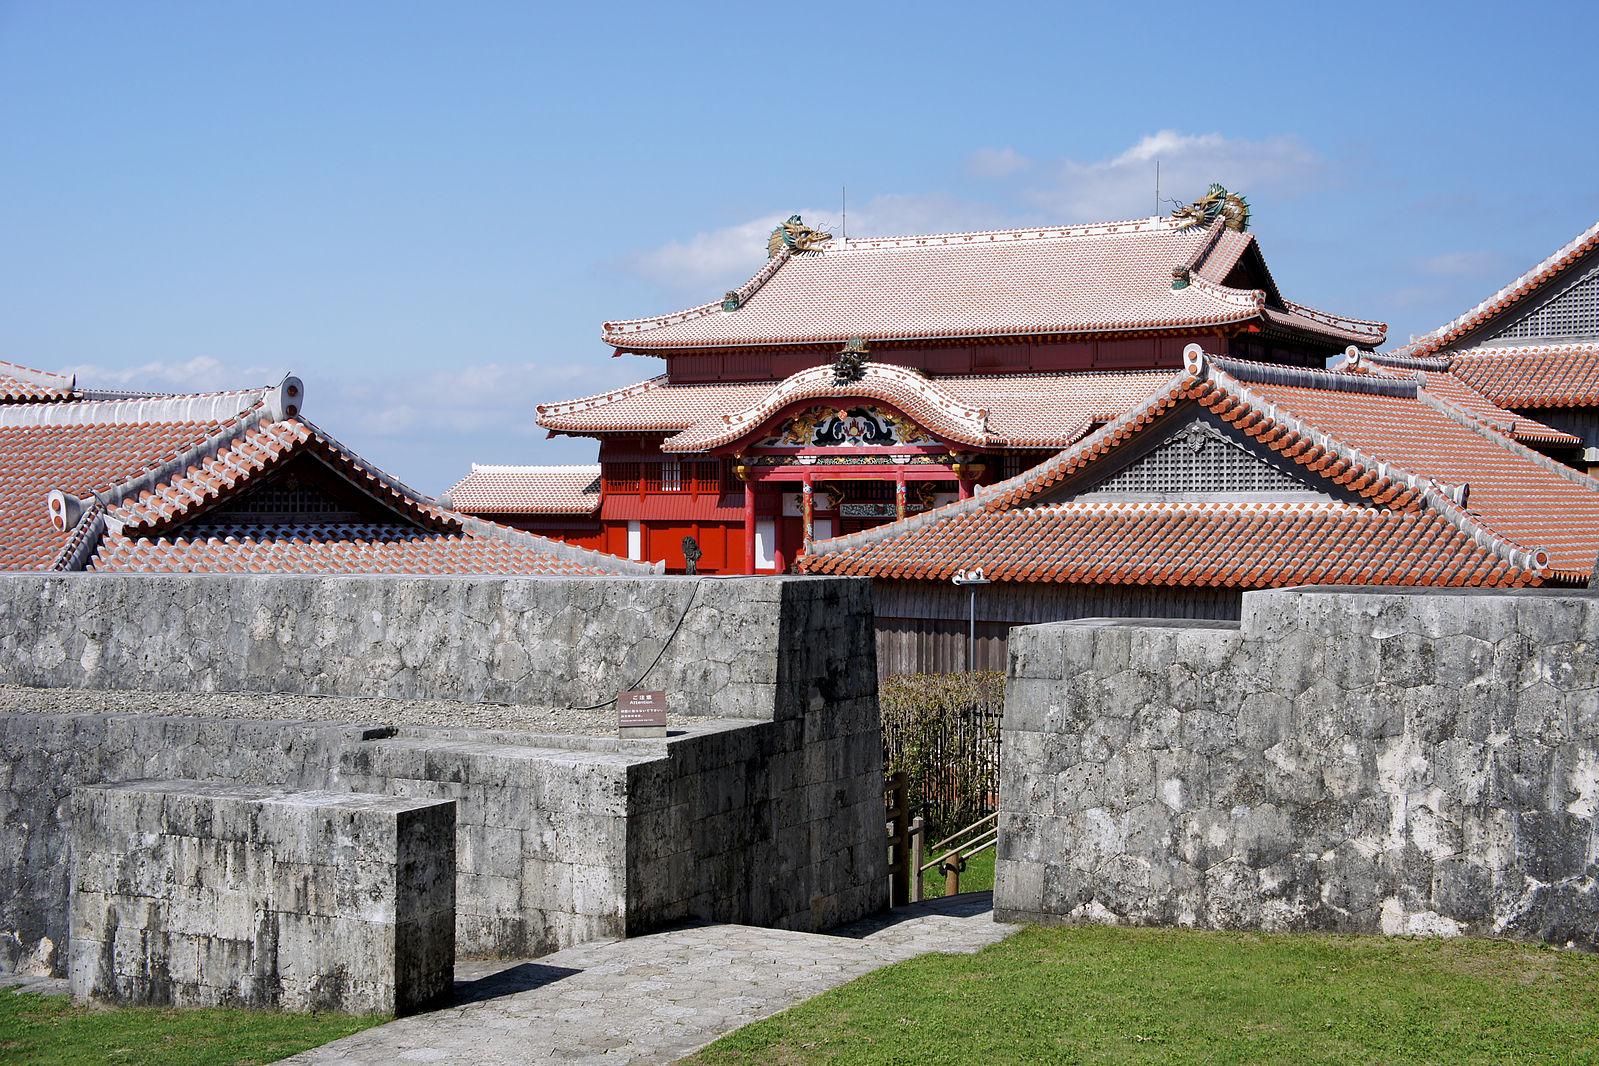 Naha_Shuri_Castle50s3s4500.jpg